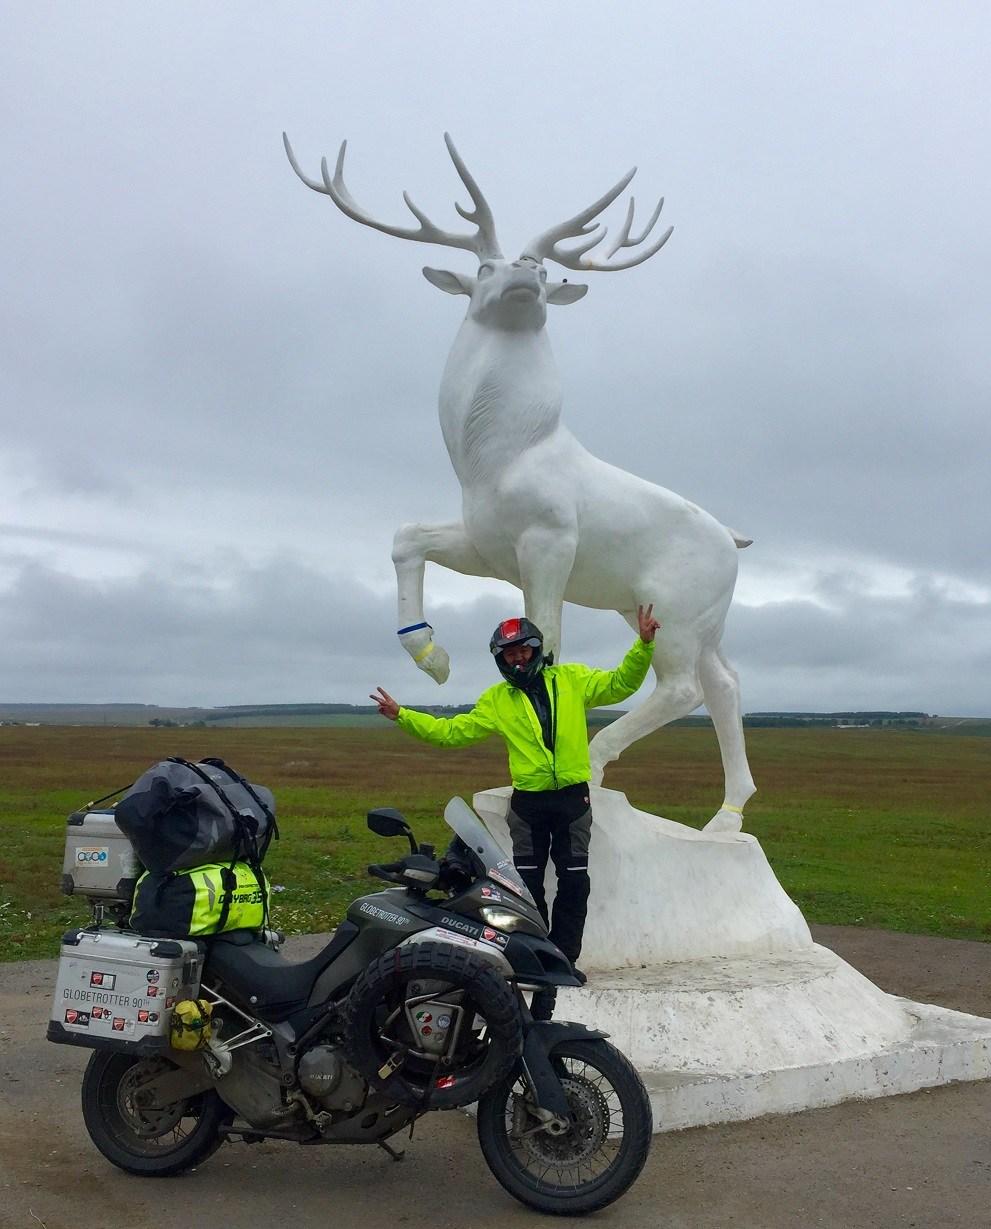 Ducati Multistrada Enduro Globetrotter 90° Siberia